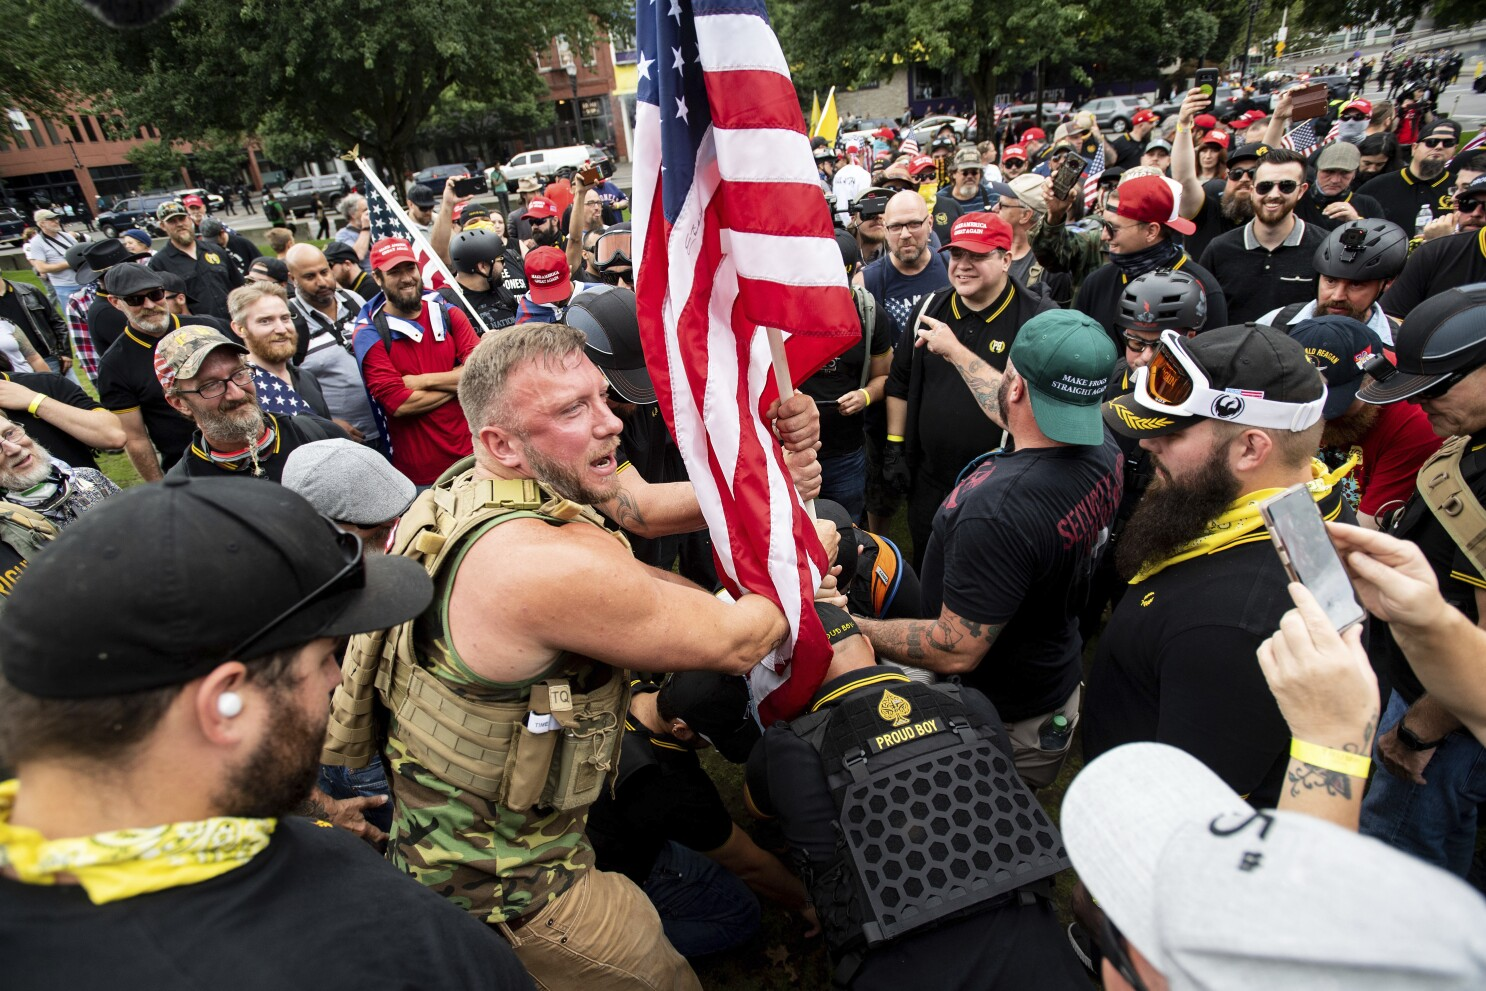 In Portland, another far-right vs. anti-fascist faceoff